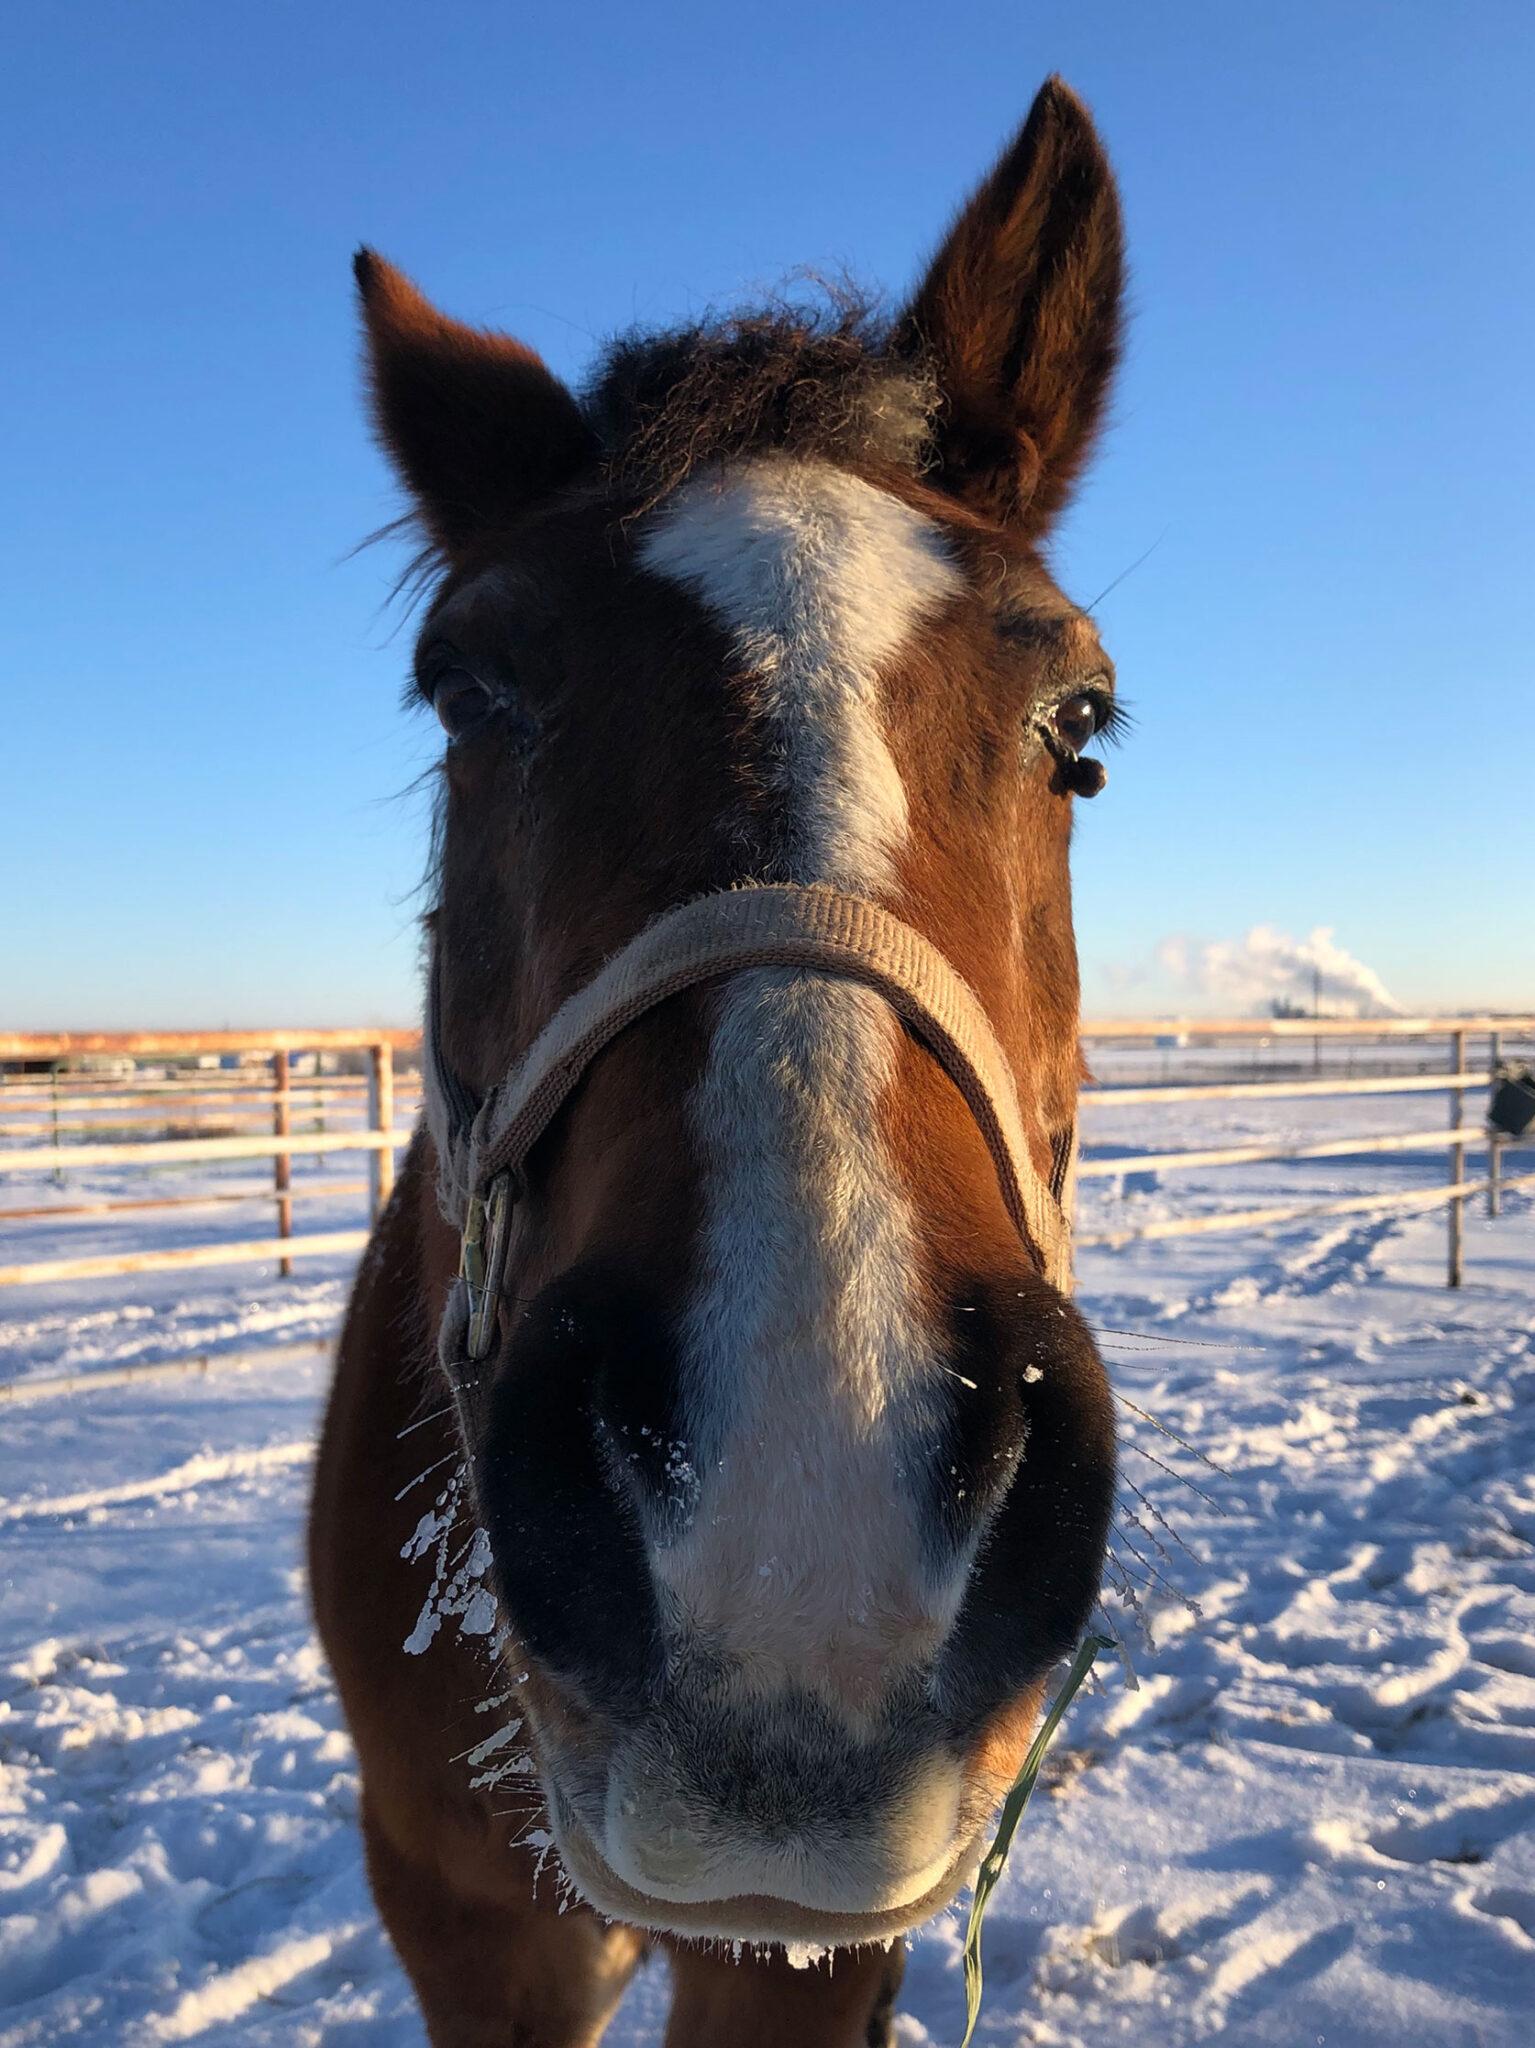 Roja the horse